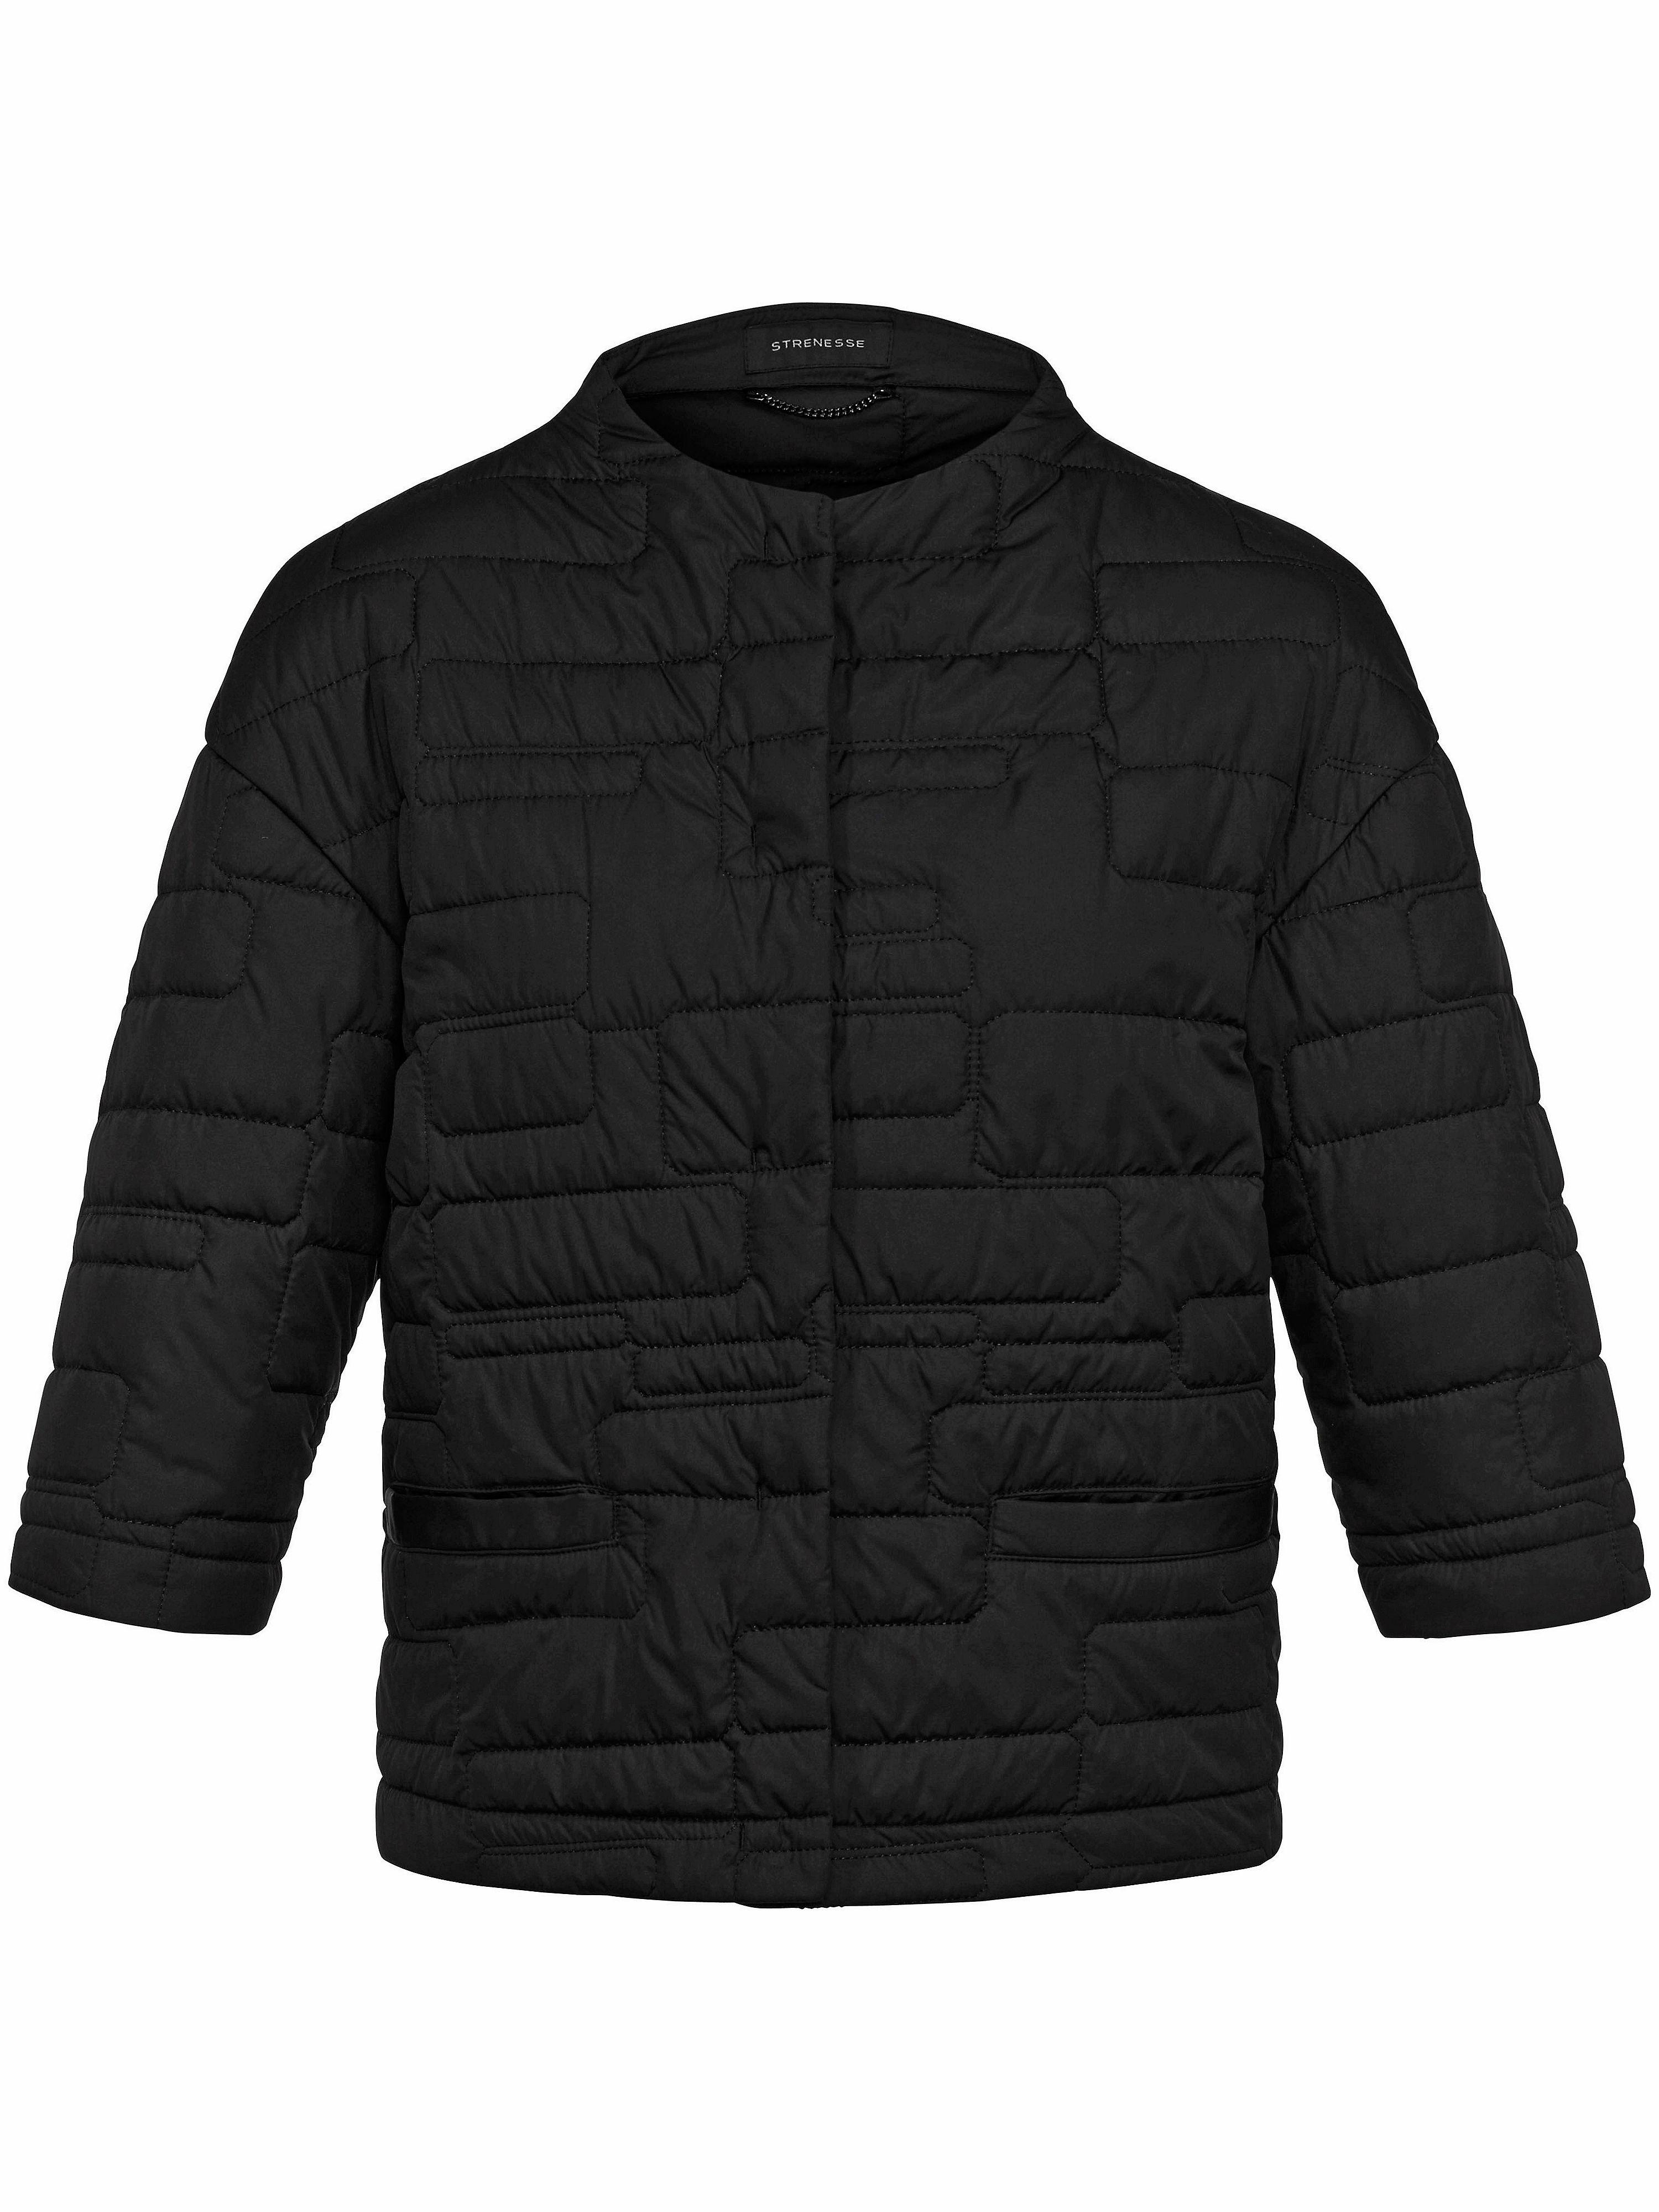 01c21ce9aec Quiltet jakke 3/4-ærmer Fra Strenesse sort